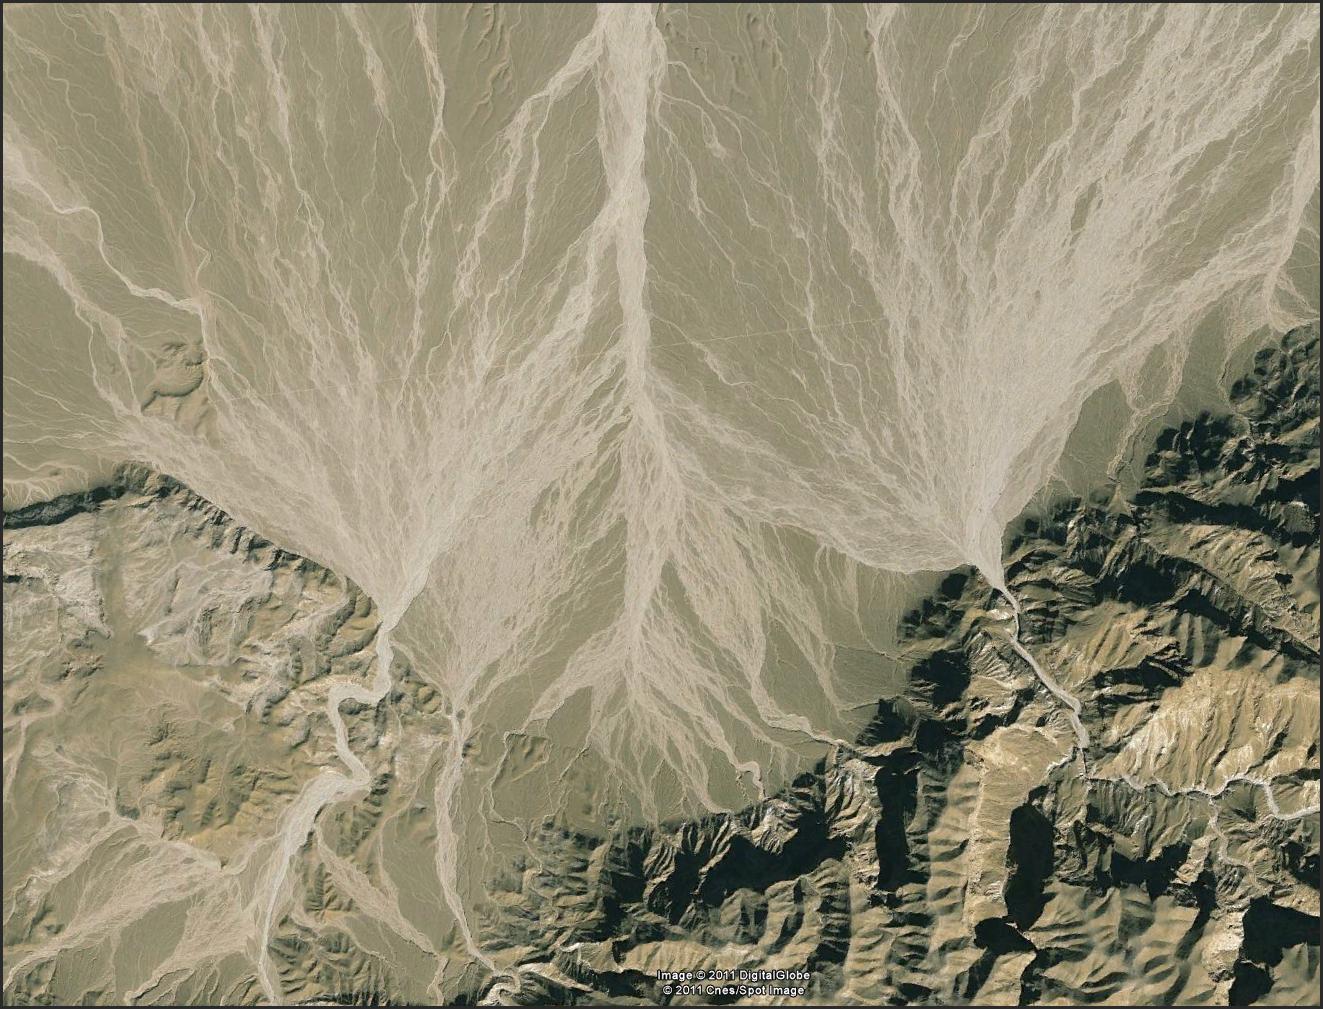 Love me those alluvial fan floods....    http://goo.gl/maps/mVnr